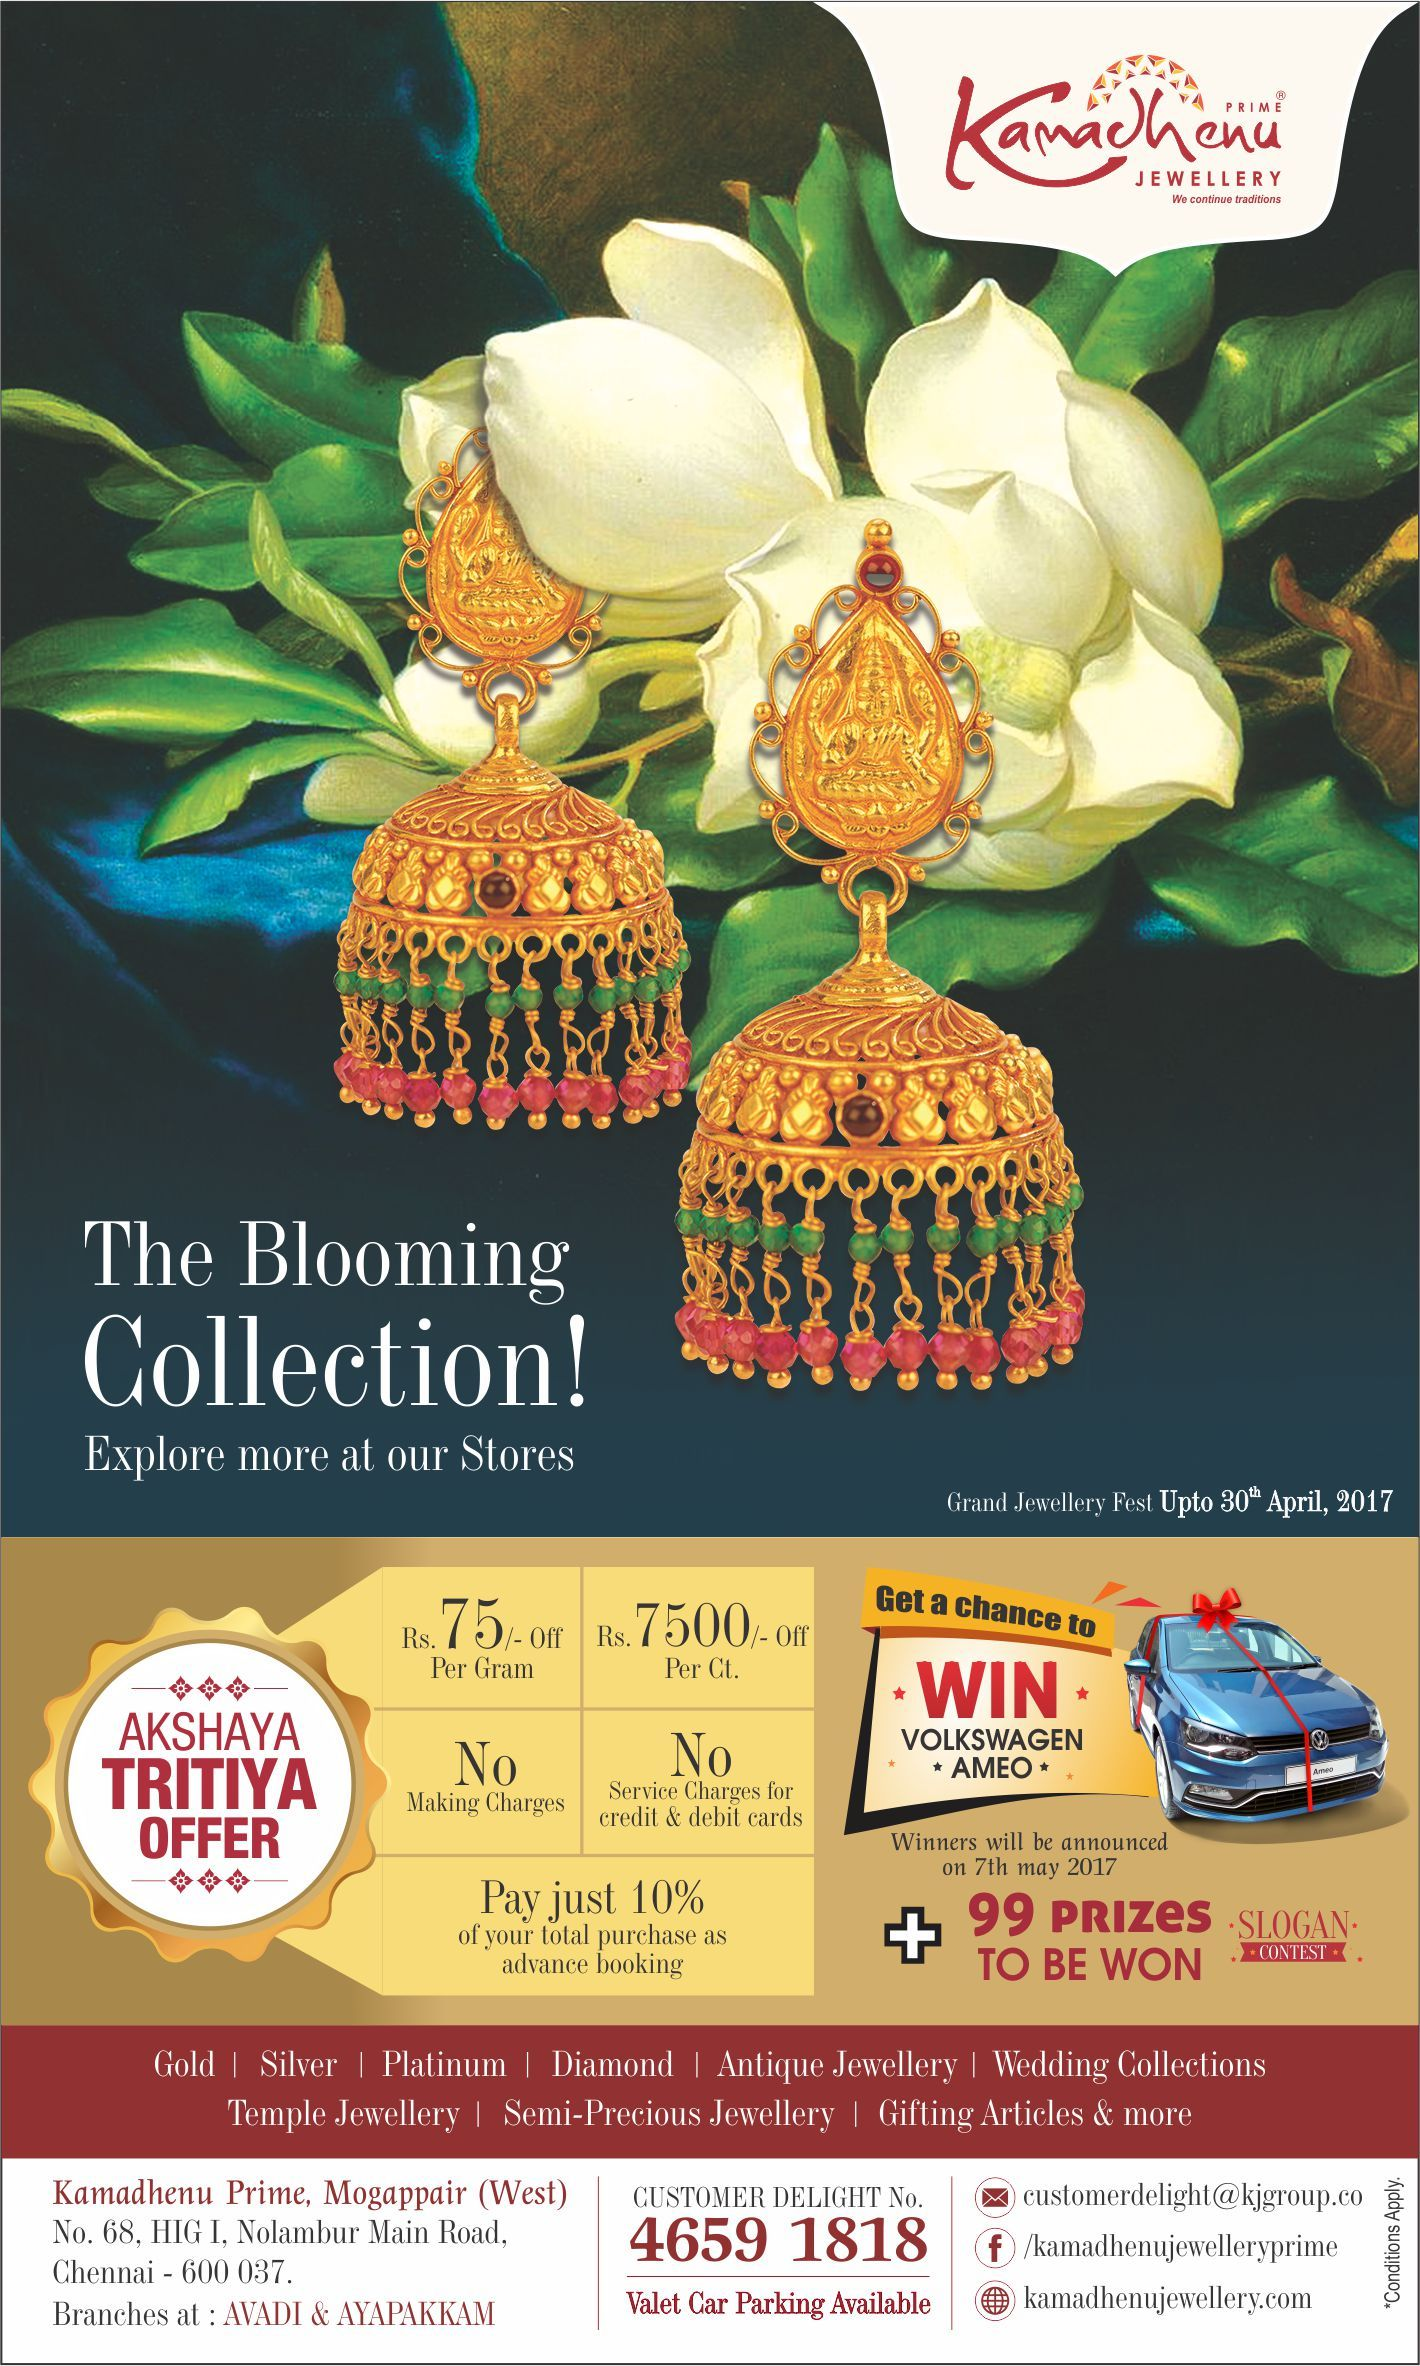 Kamadhenu Jewellery - AkshayaTritiya Offer Ad published in ...